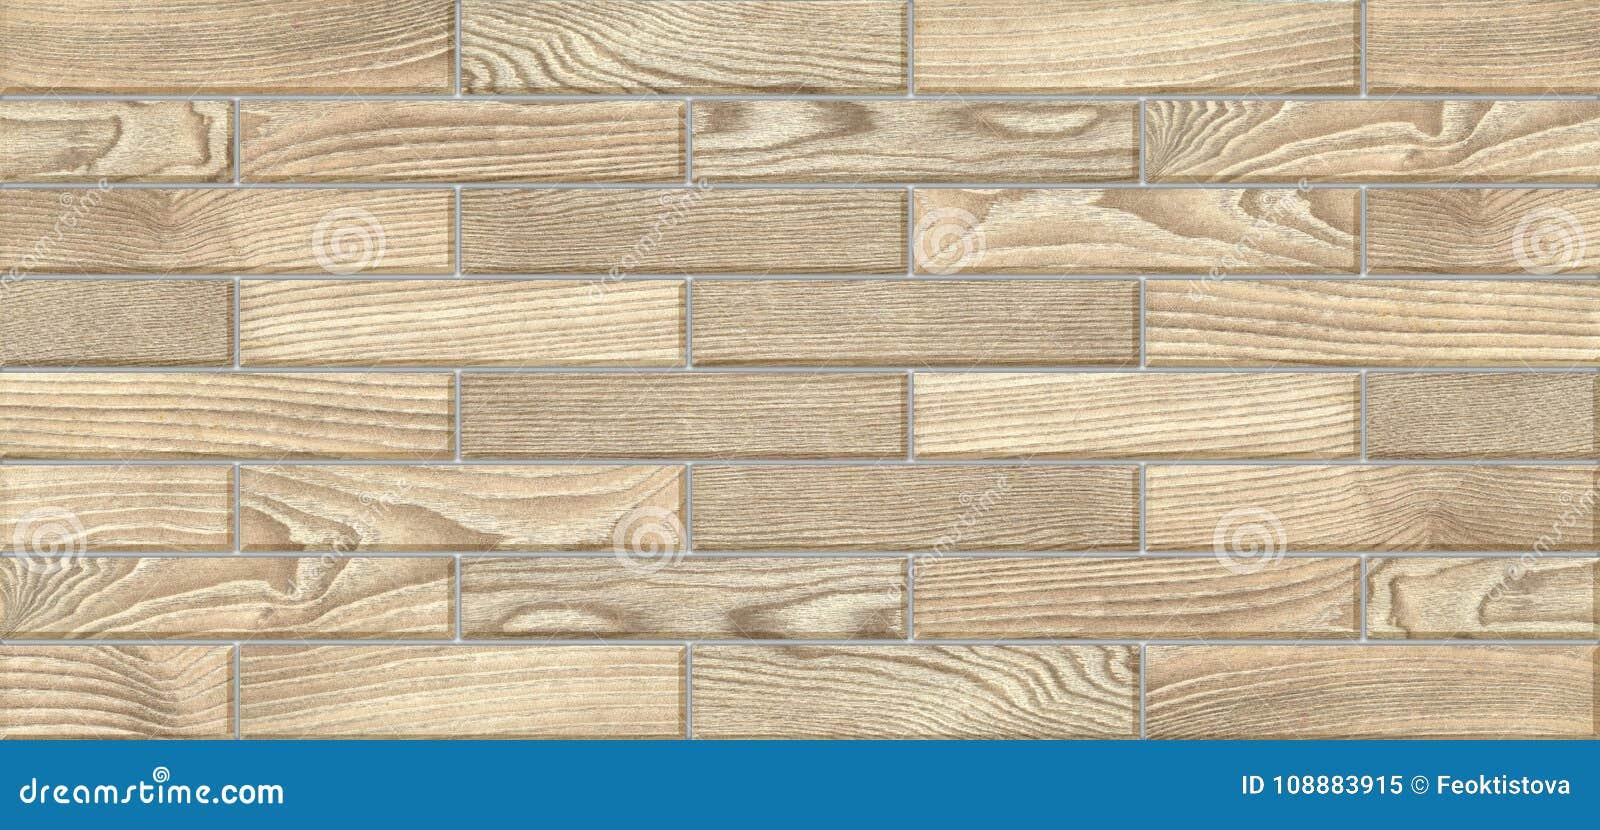 . Digital Tiles Design  Colorful Ceramic Wall Tiles Decoration Stock